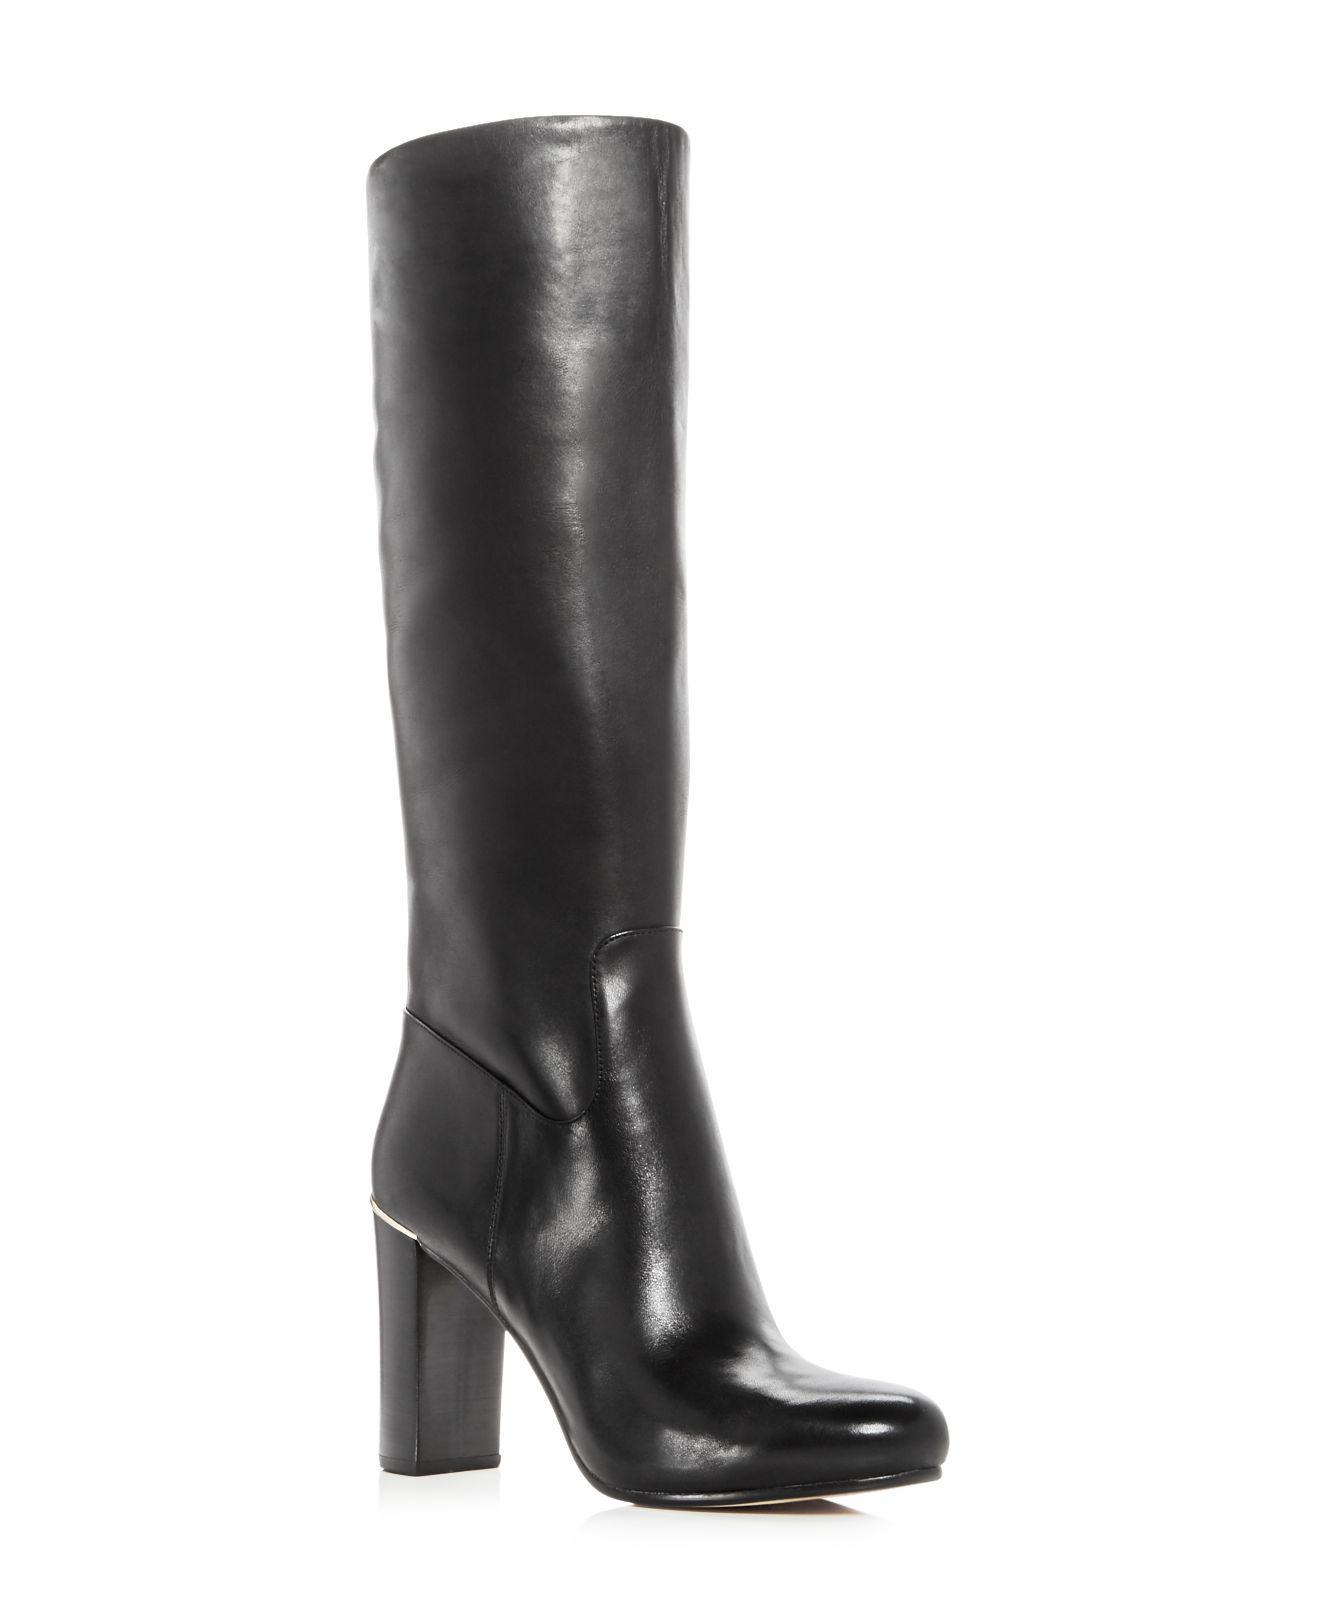 6fb93fb8ded6 Michael Kors Janice Boots in Black - Lyst